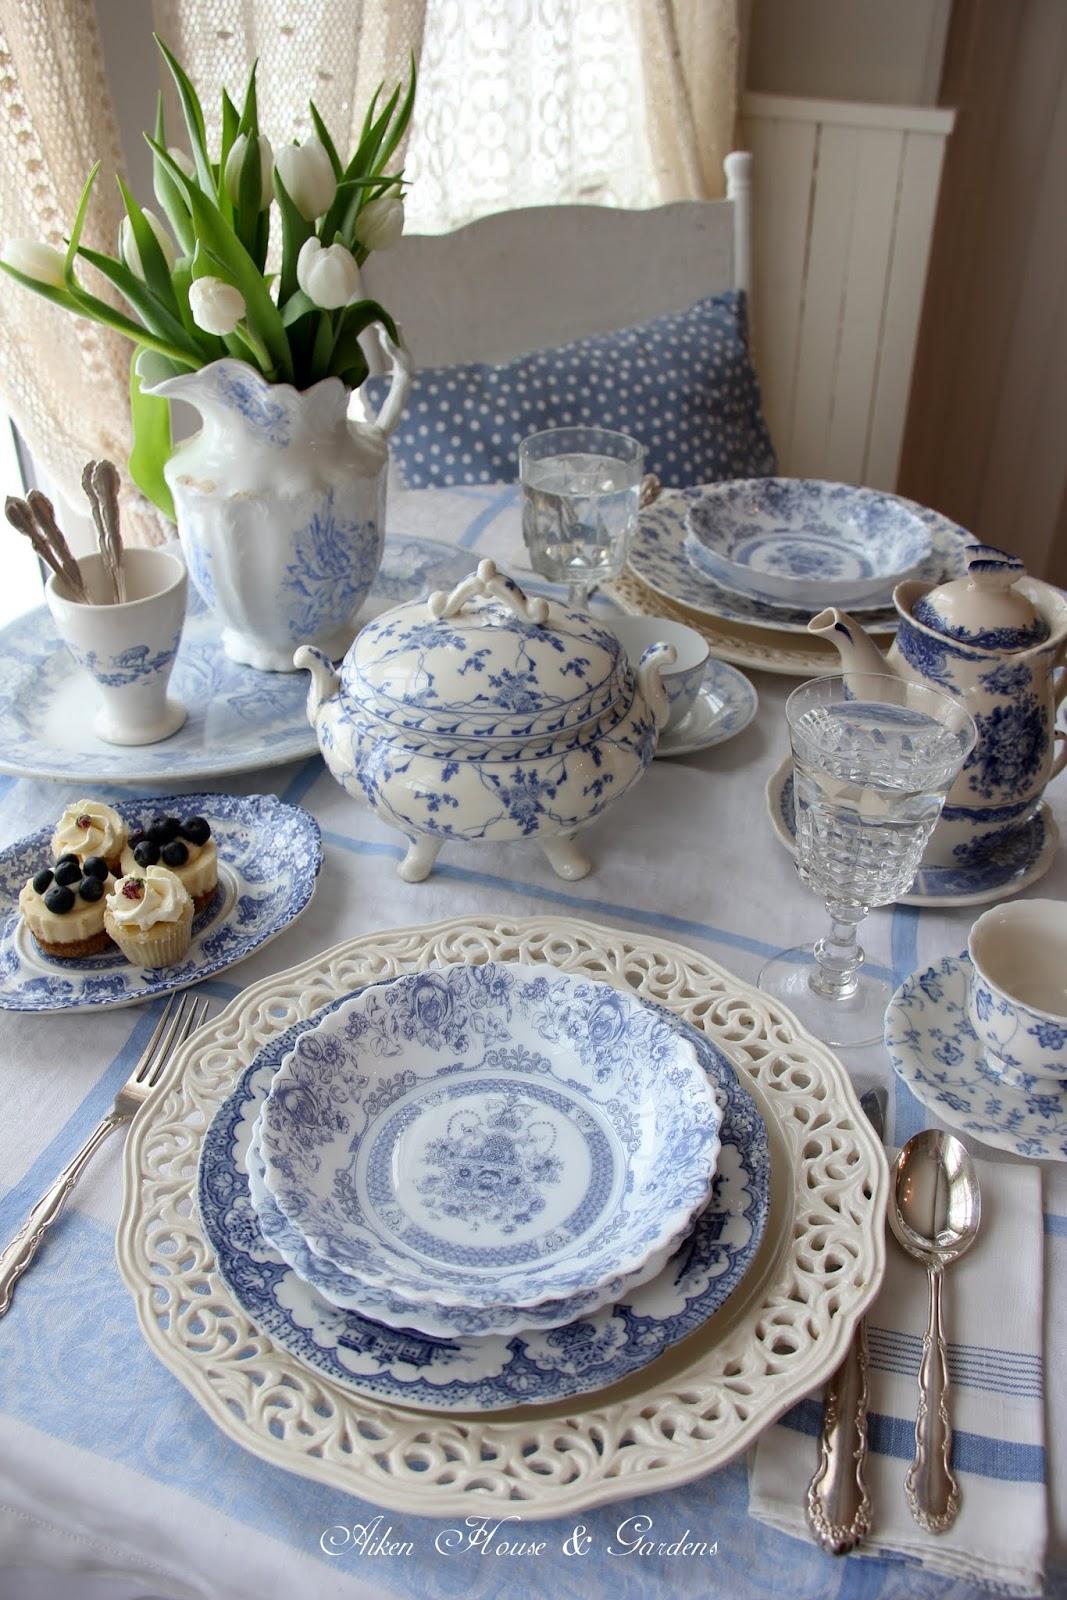 Aiken House & Gardens: Blue & White Transferware Lunch